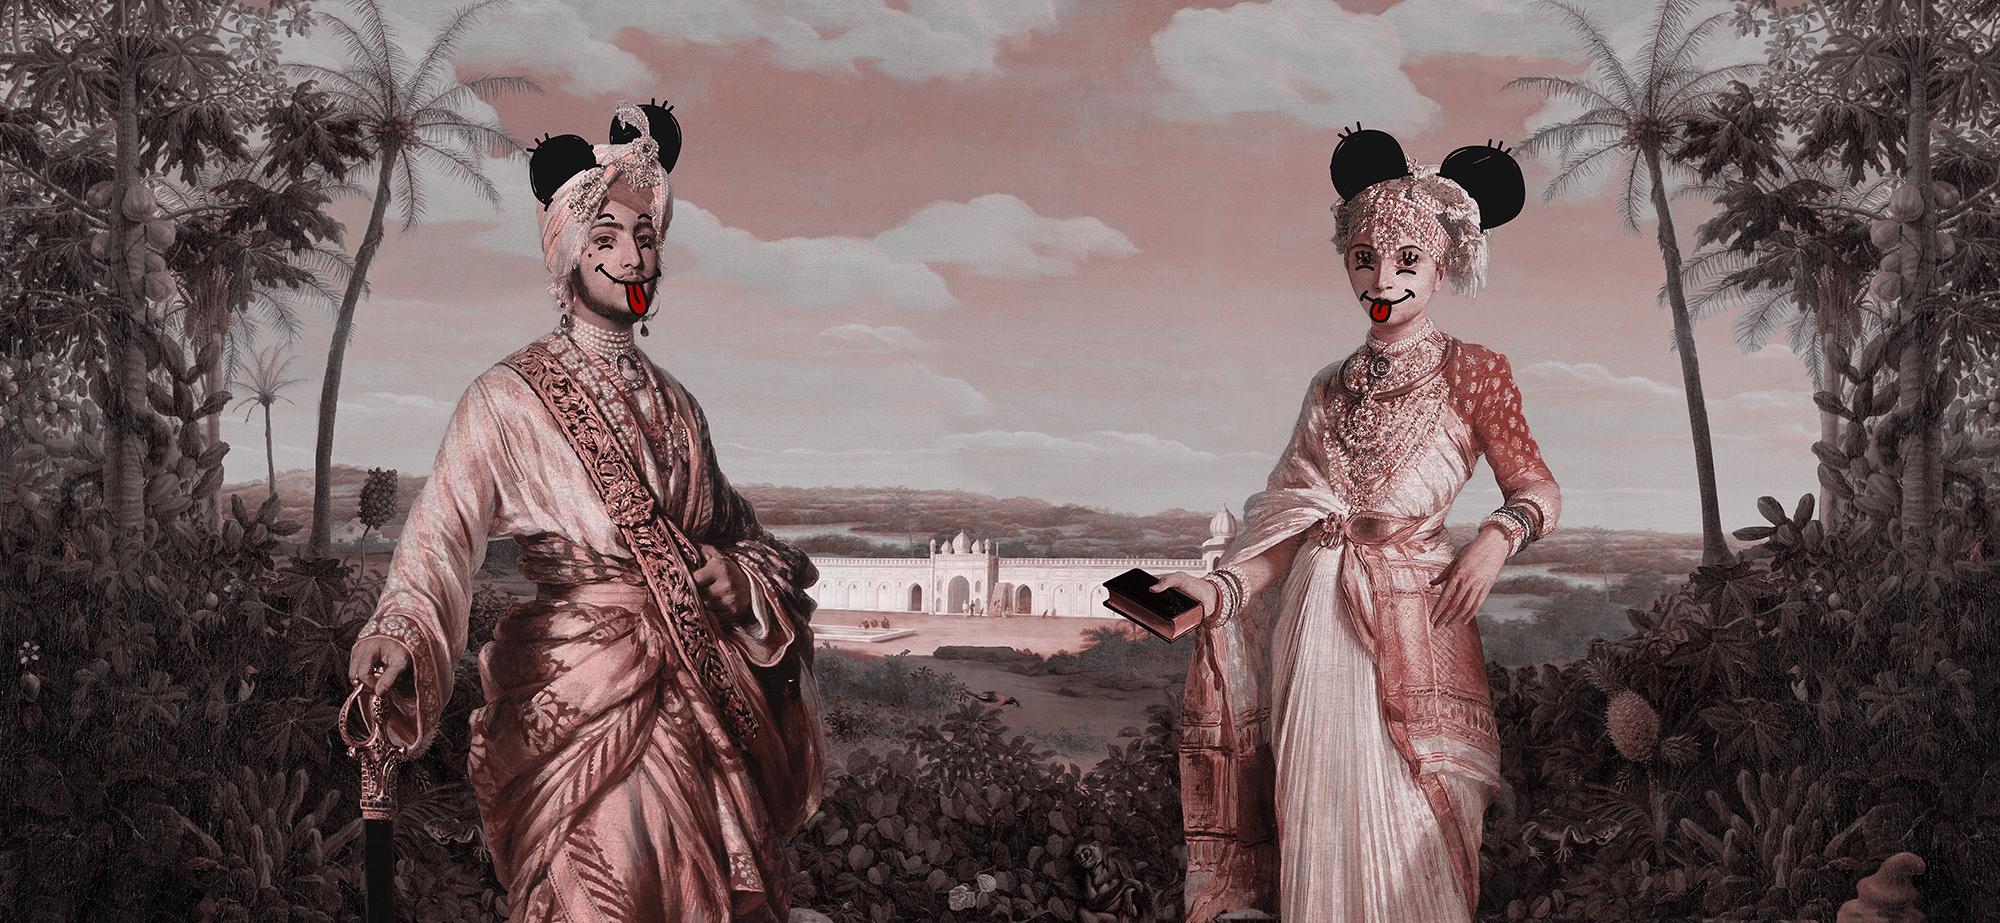 Visual Artwork: THE MAHARAJAH & THE MAHARANI by artist and creator Magnus Gjoen